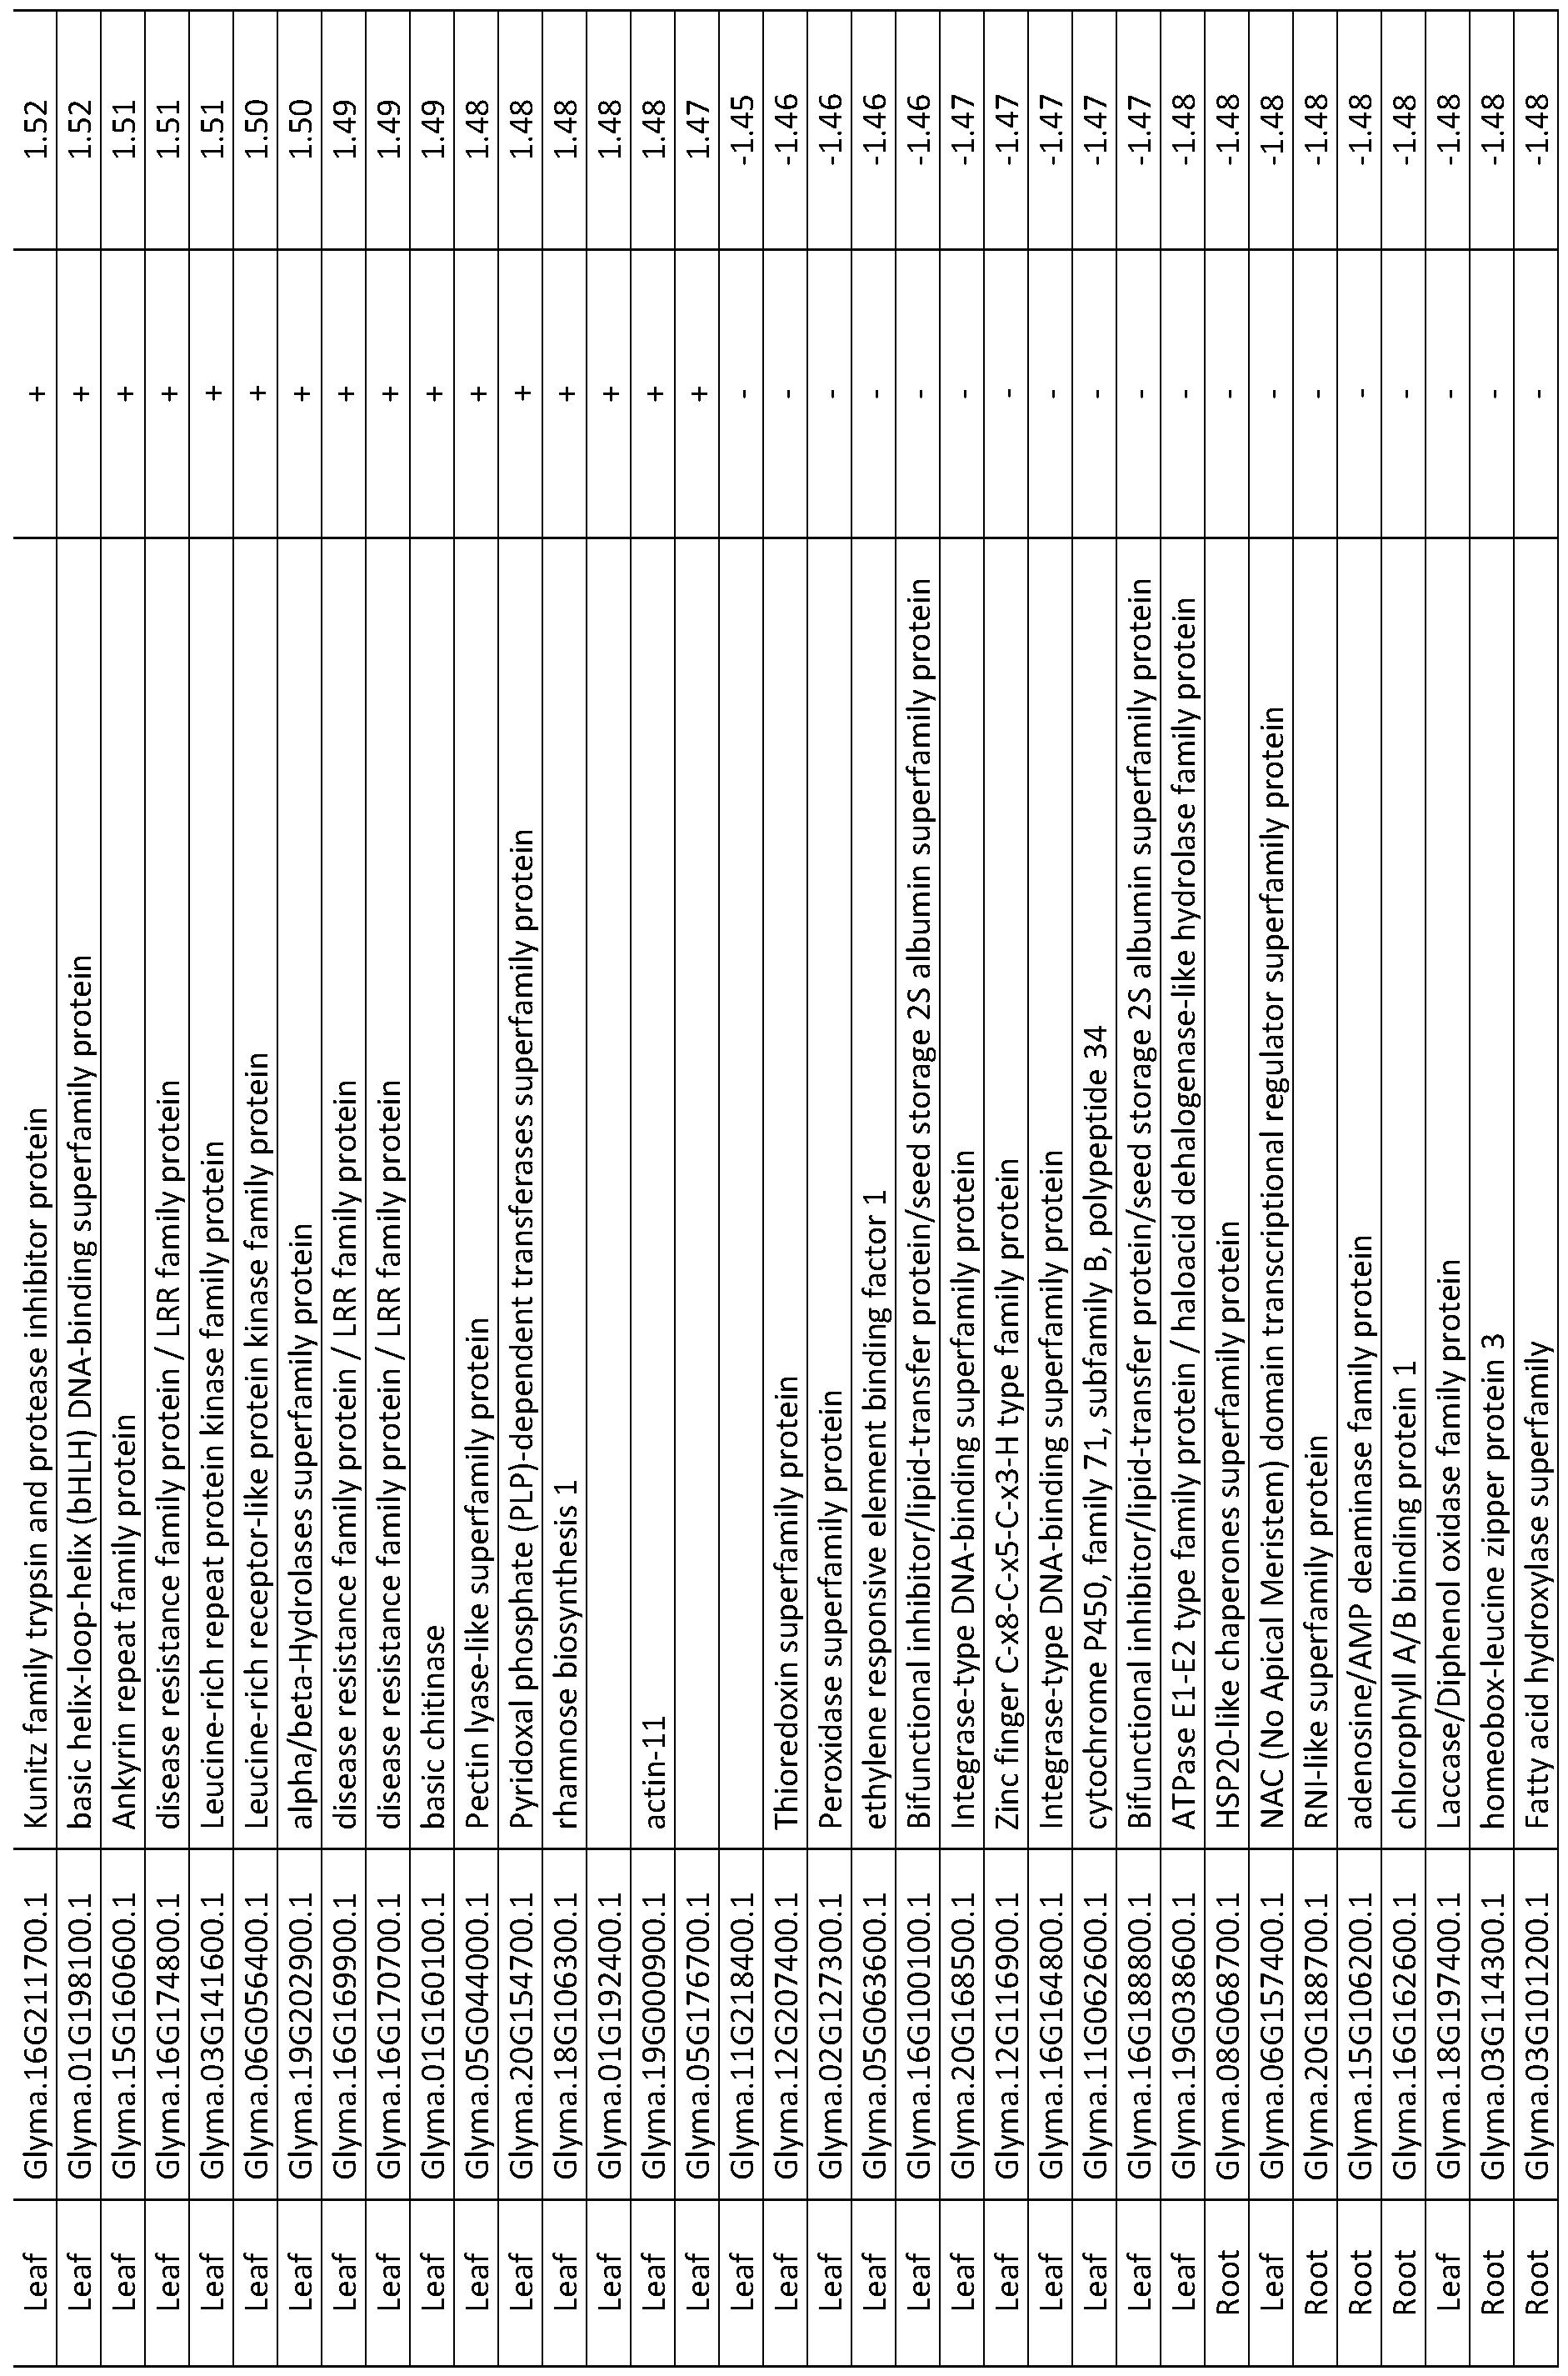 WO2016210238A1 - Penicillium endophyte compositions and